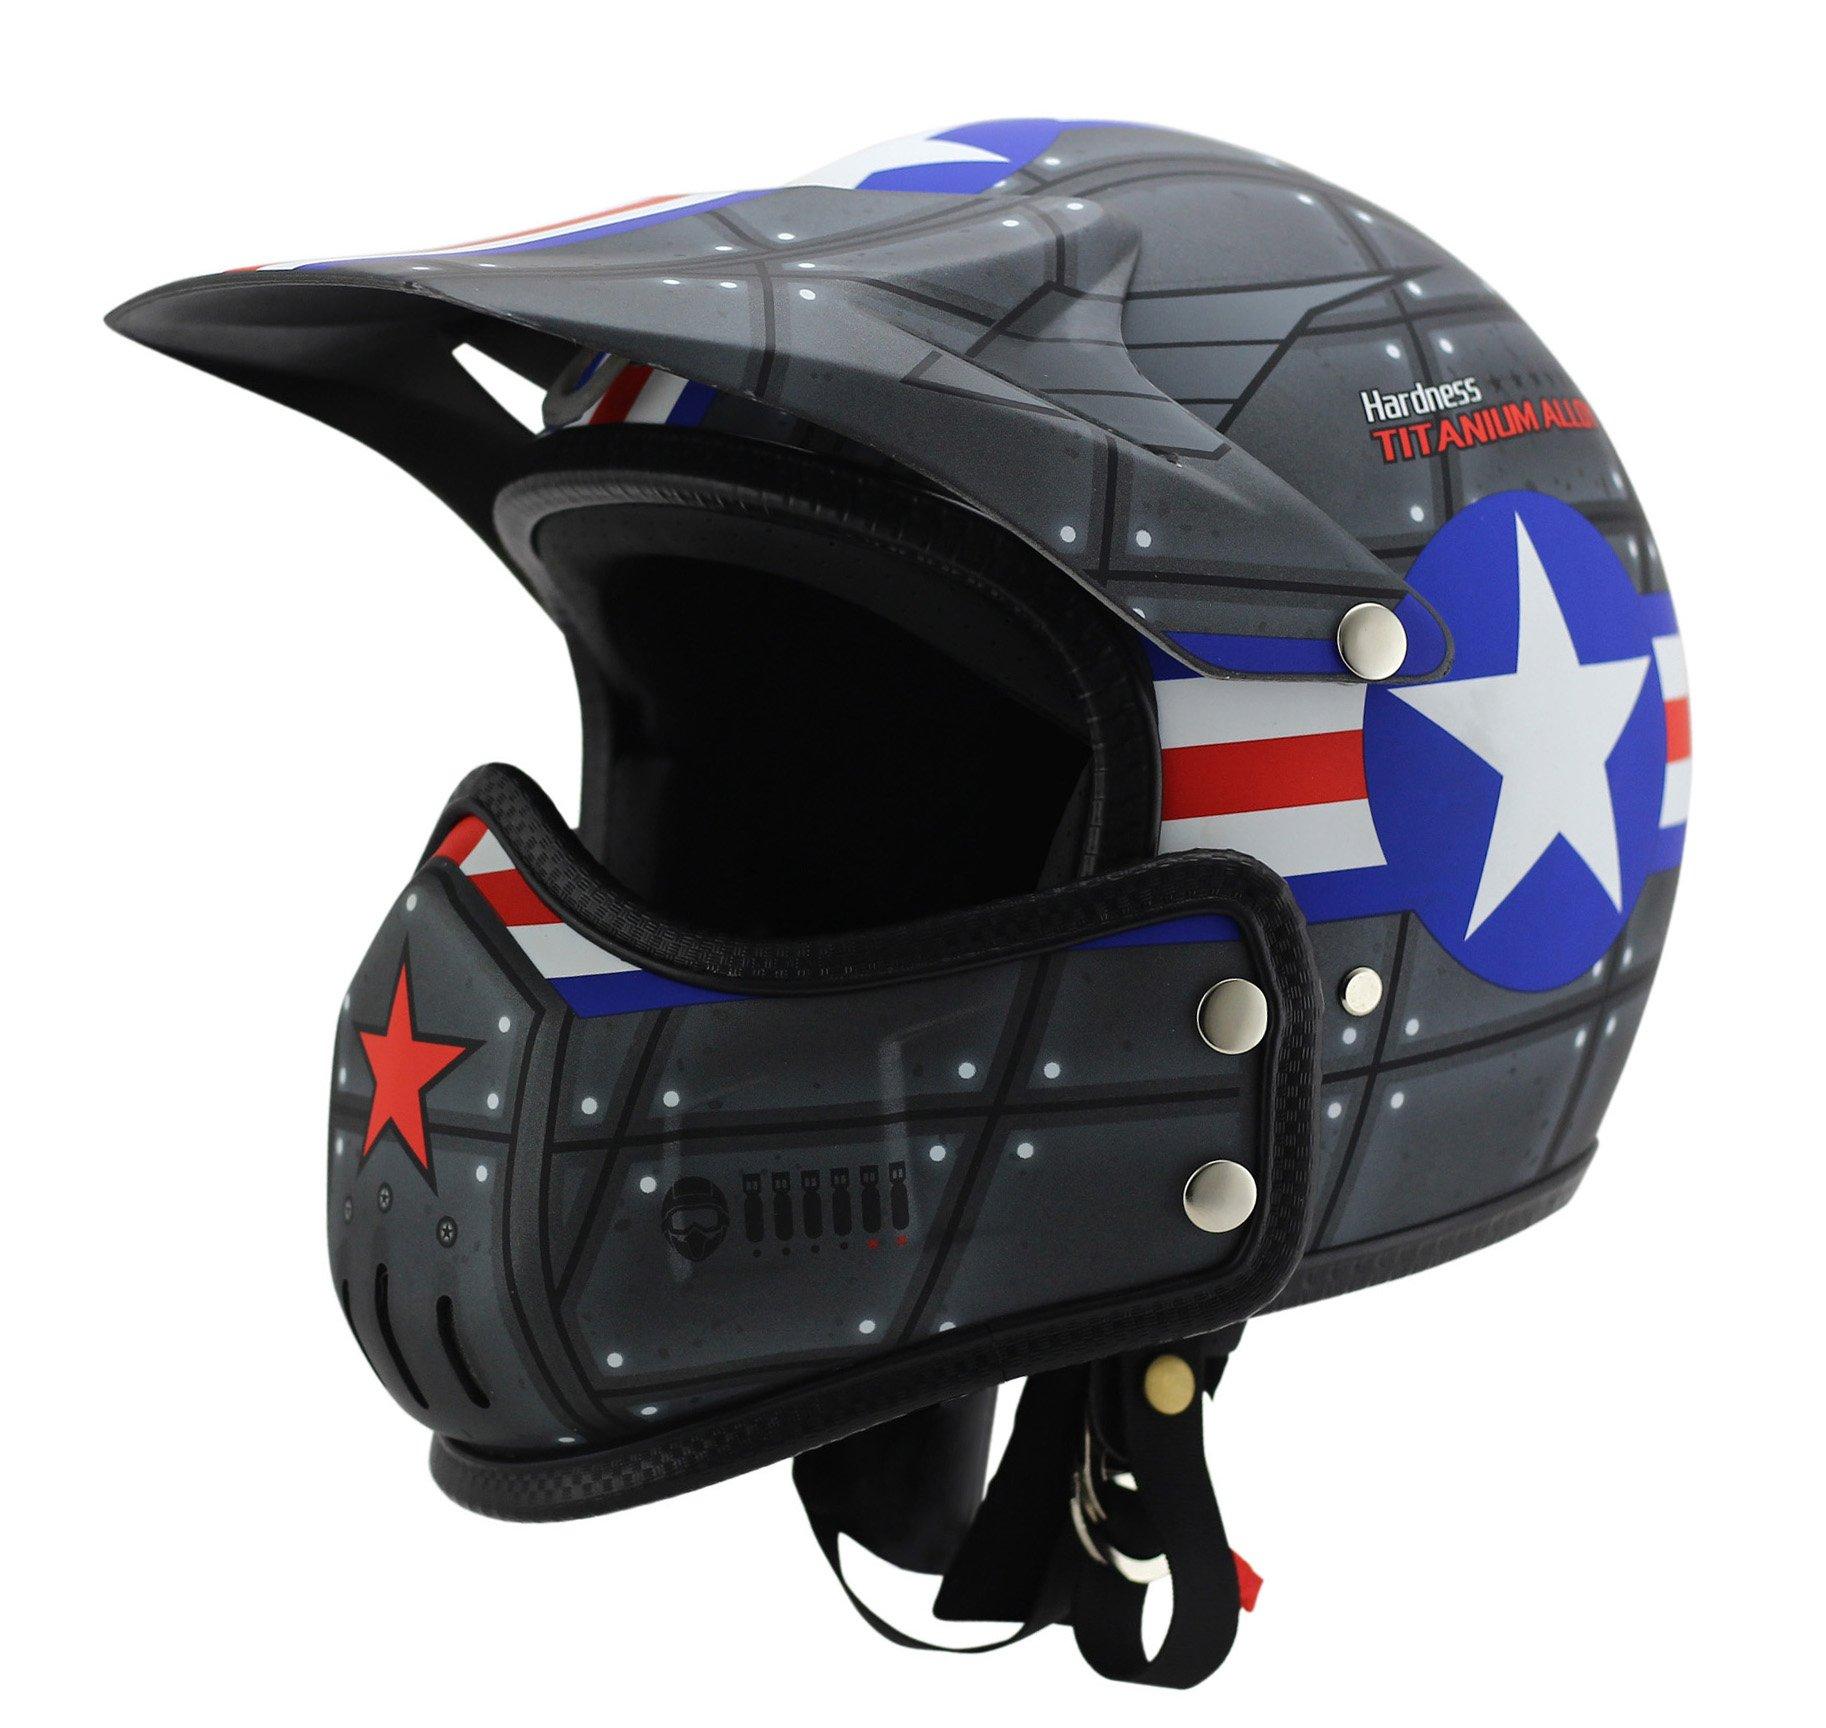 Woljay Dual Sport Off Road Motorcycle Open Face Helmet Dirt Bike ATV D.O.T certified (S)